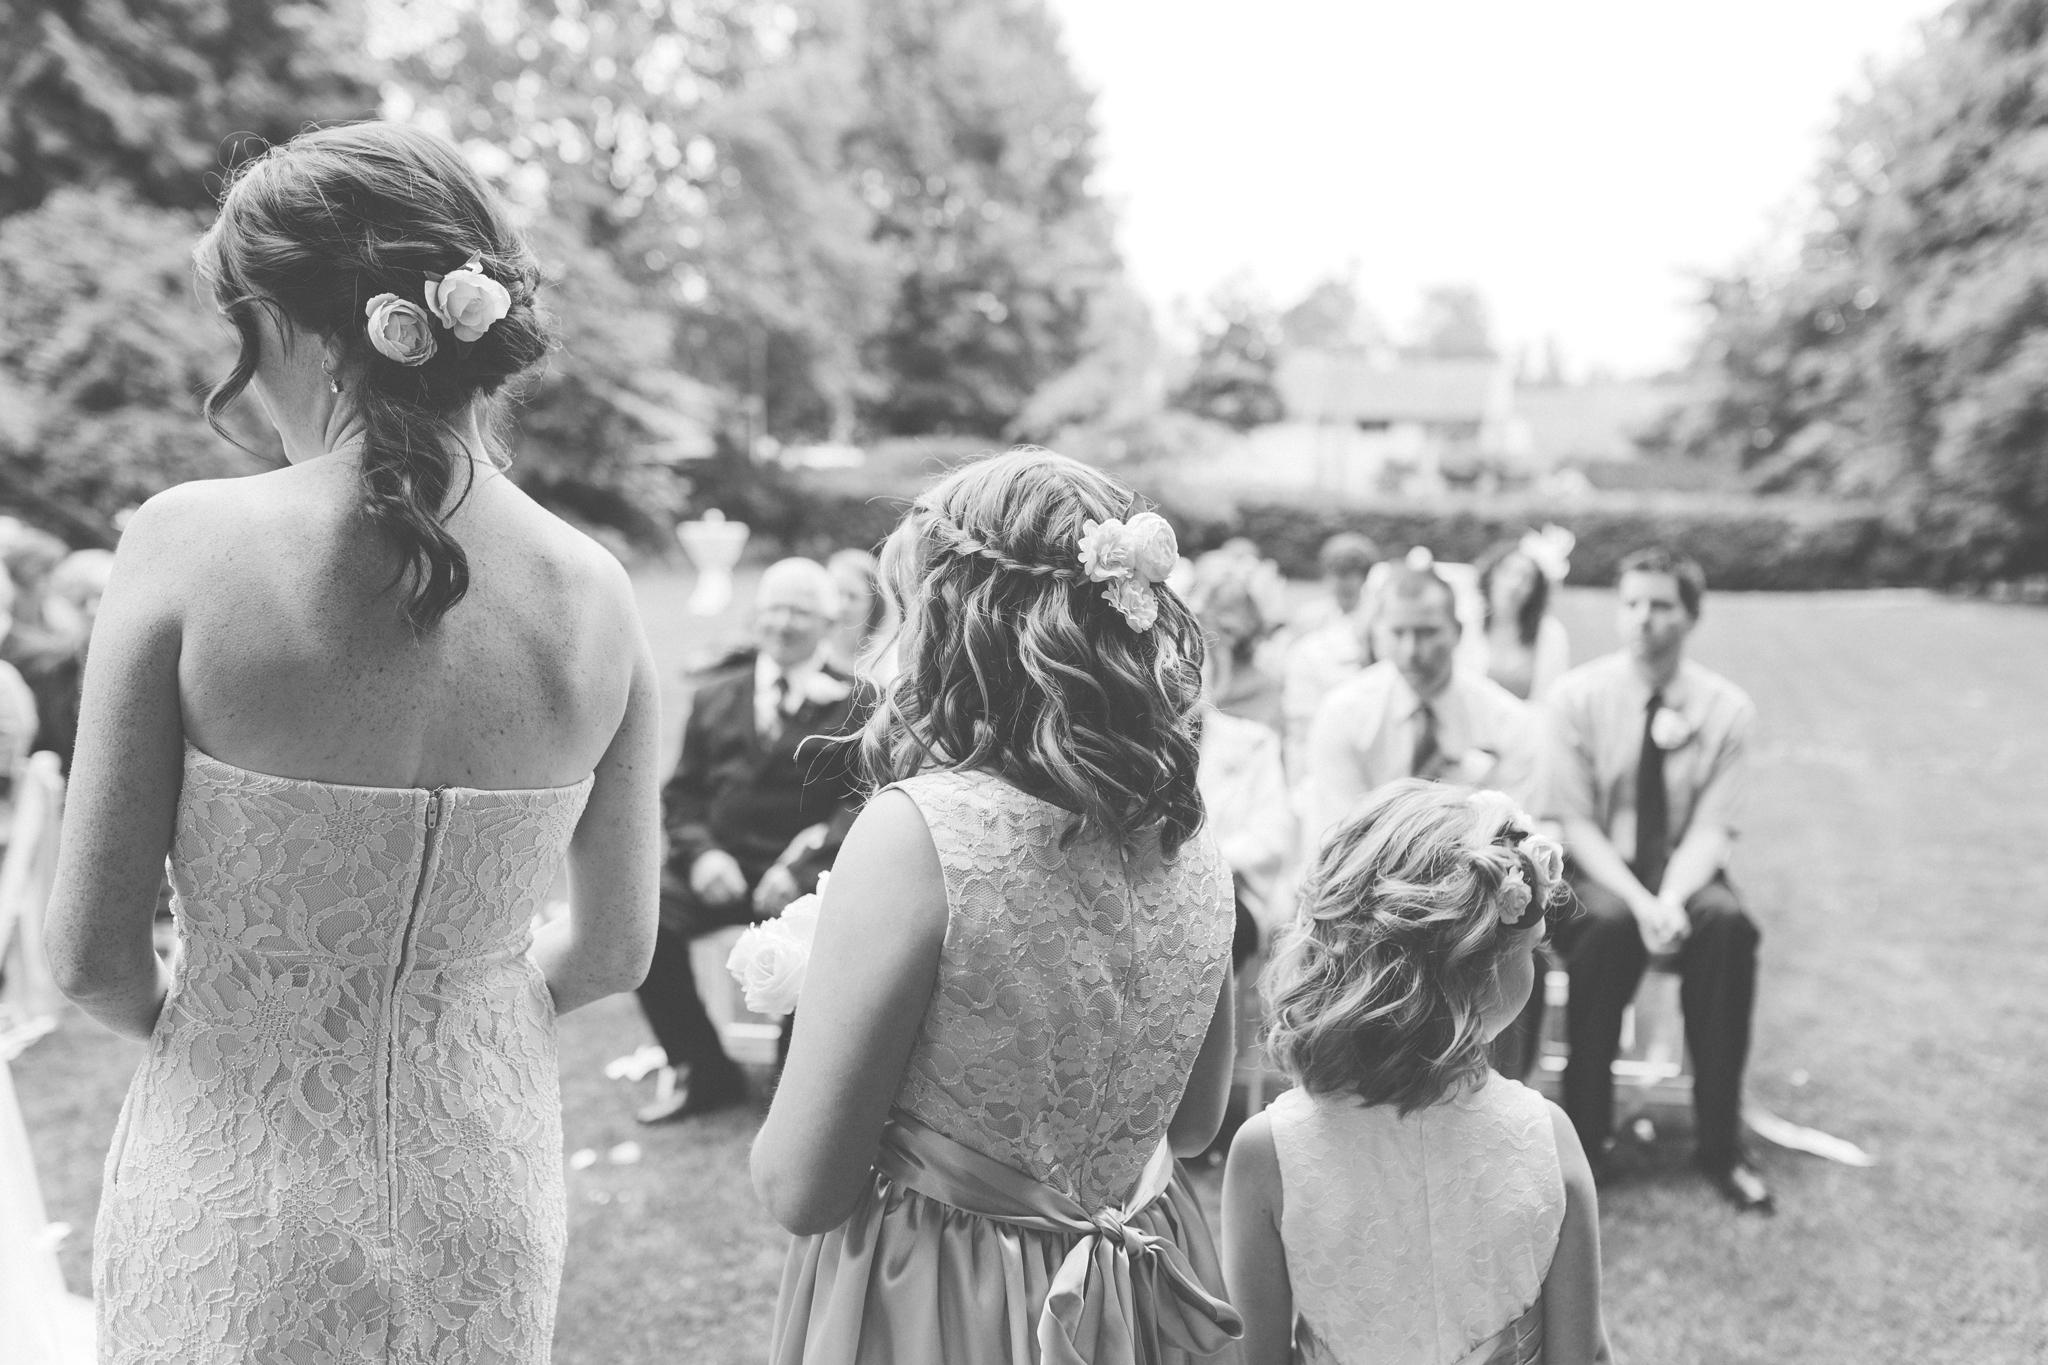 IMG_5371-VANCOUVER-WEDDING-PHOTOGRAPHER-JENNIFER-PICARD-PHOTOGRAPHY.jpg